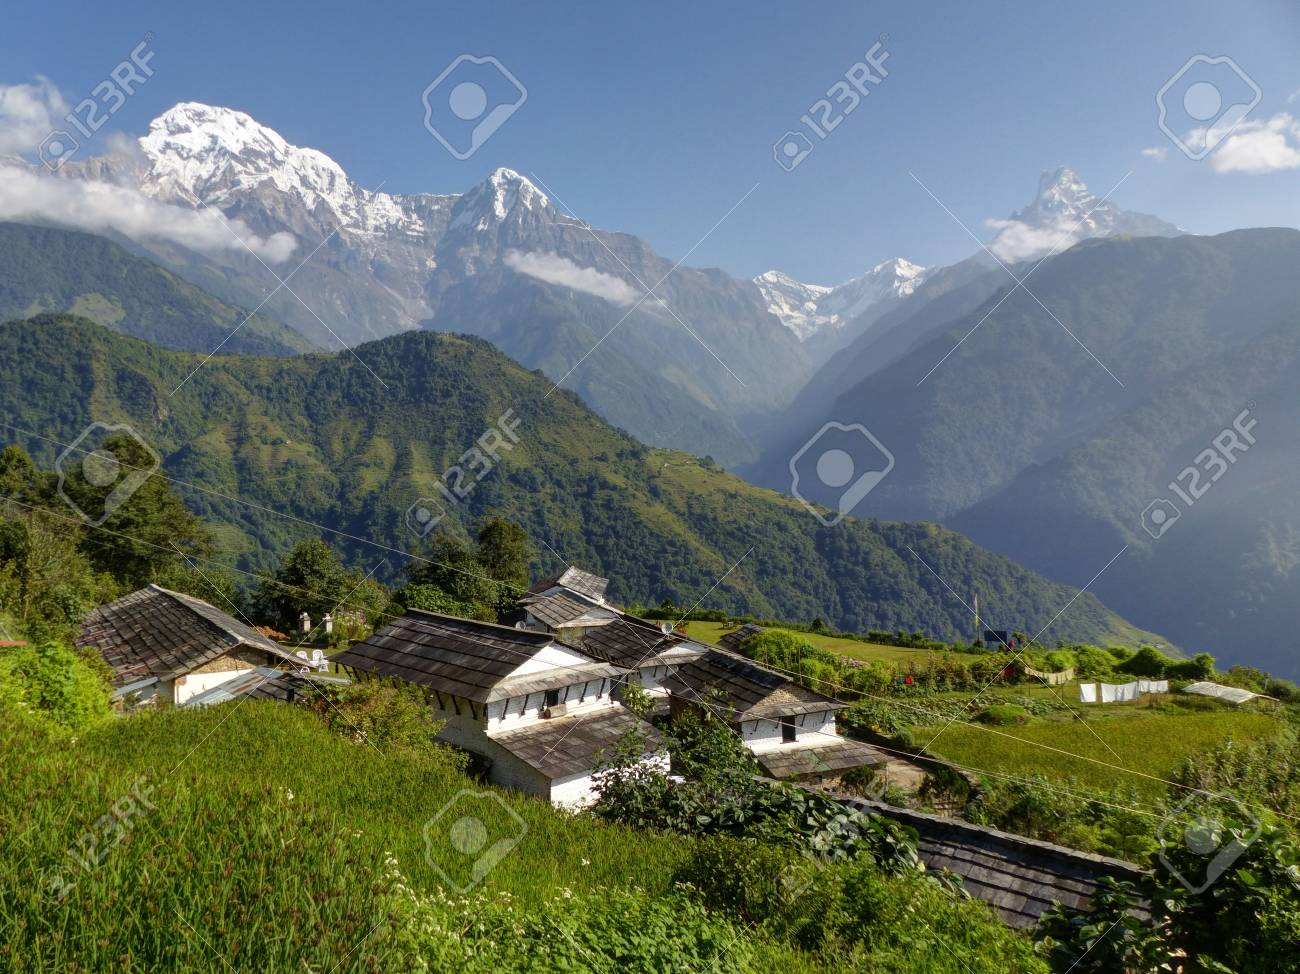 Snow Capped Himalaya Annapurna Range From Beautiful Village Stock